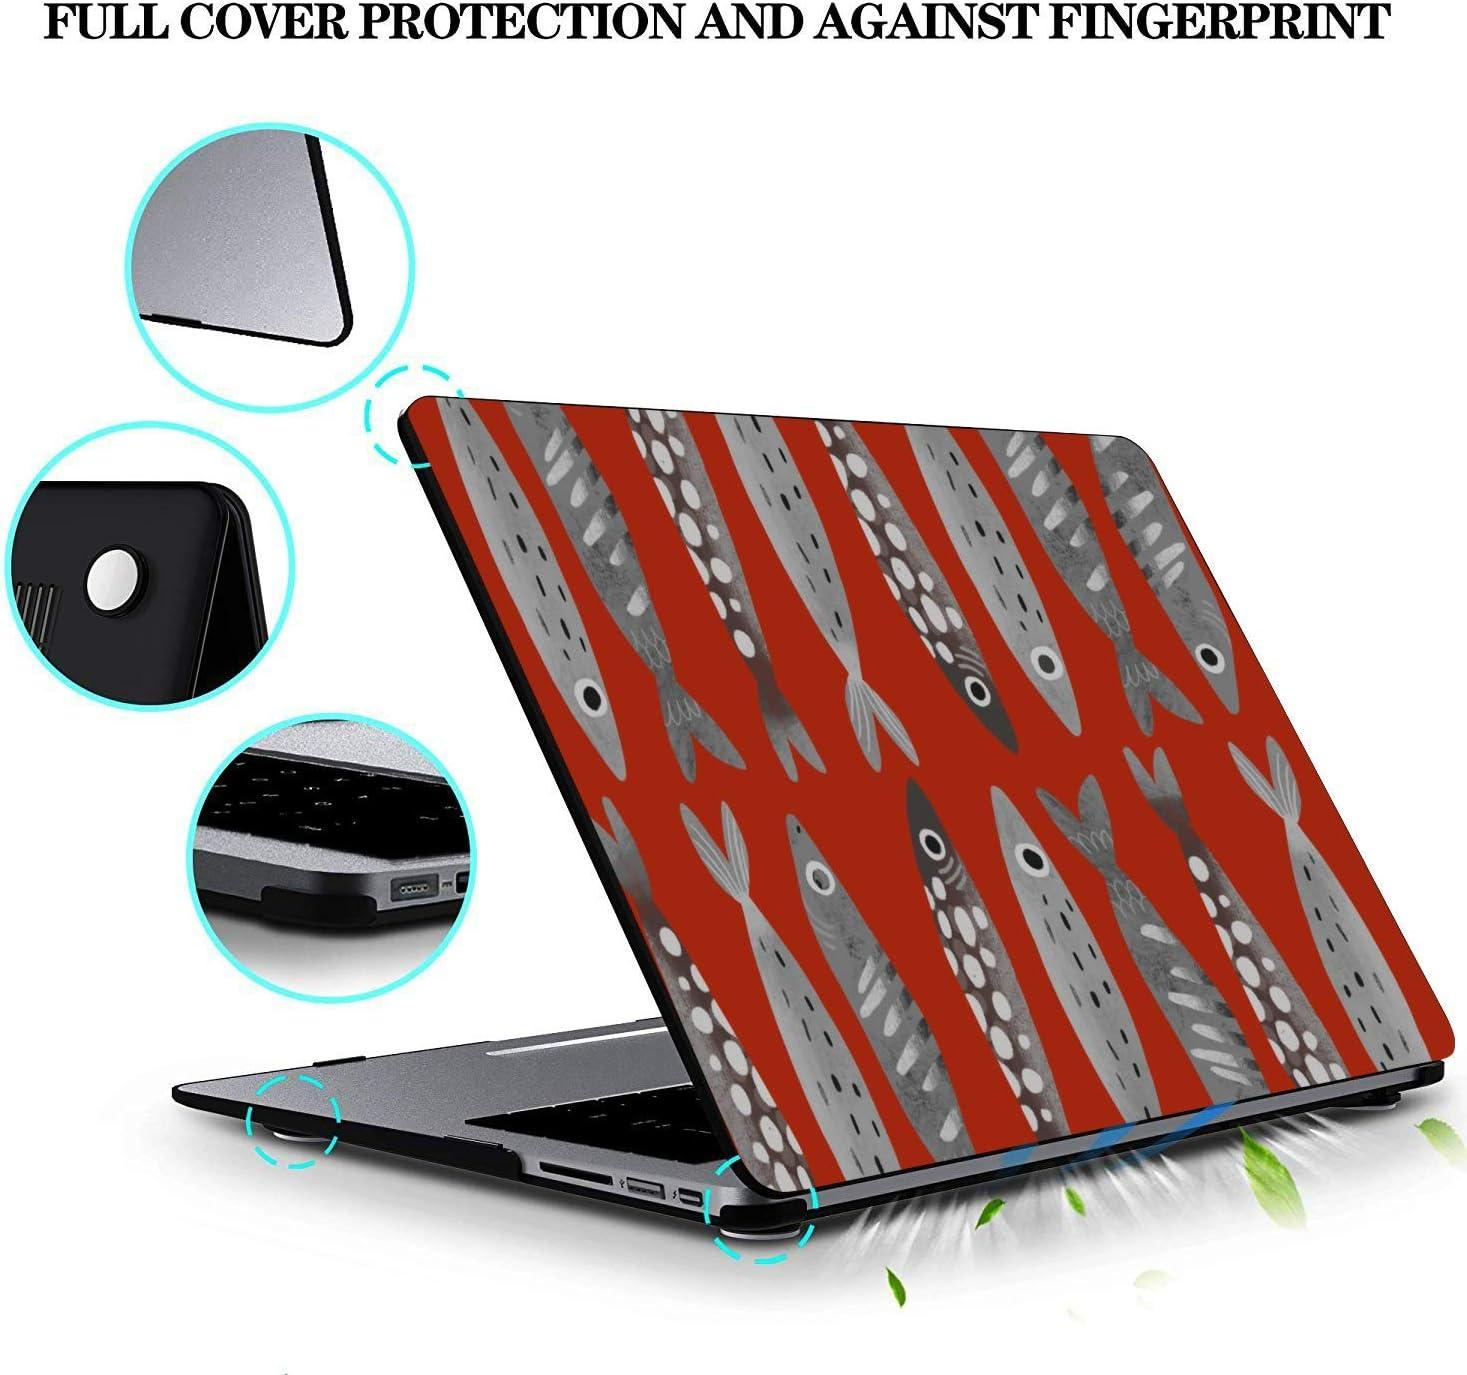 2018 MacBook Pro Accessories Sea Creatures Ornamental Fish Squid Plastic Hard Shell Compatible Mac Air 11 Pro 13 15 MacBook Air 1466 Case Protection for MacBook 2016-2019 Version